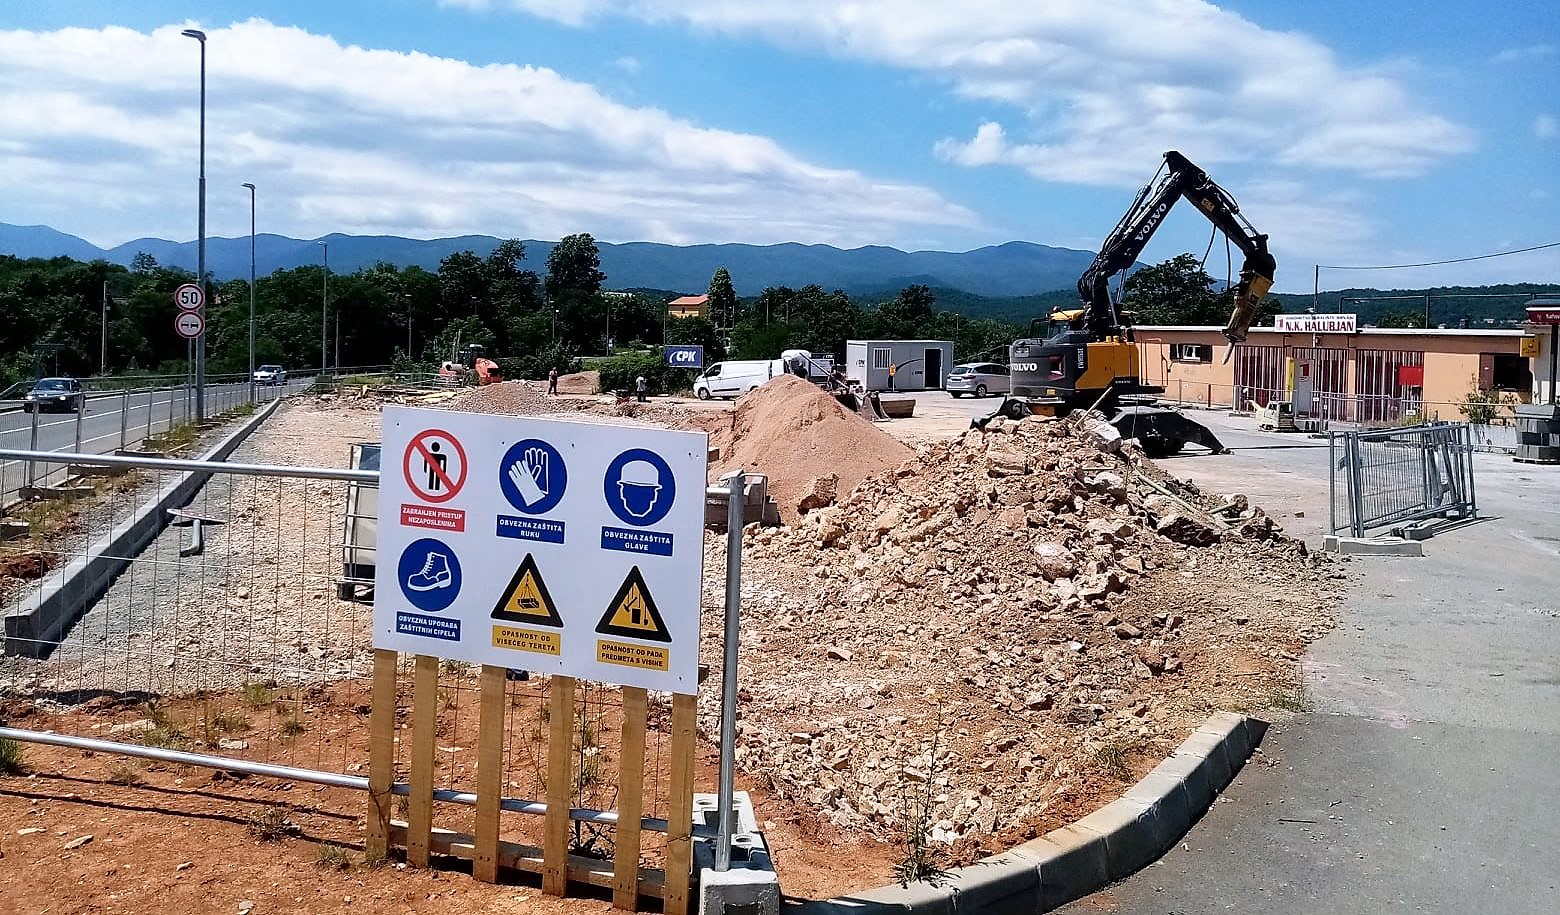 (FOTO) VIŠKOVO Nazire se novo parkiralište uz NK Halubjan; Do sredine kolovoza novih 50-ak parkirnih mjesta!